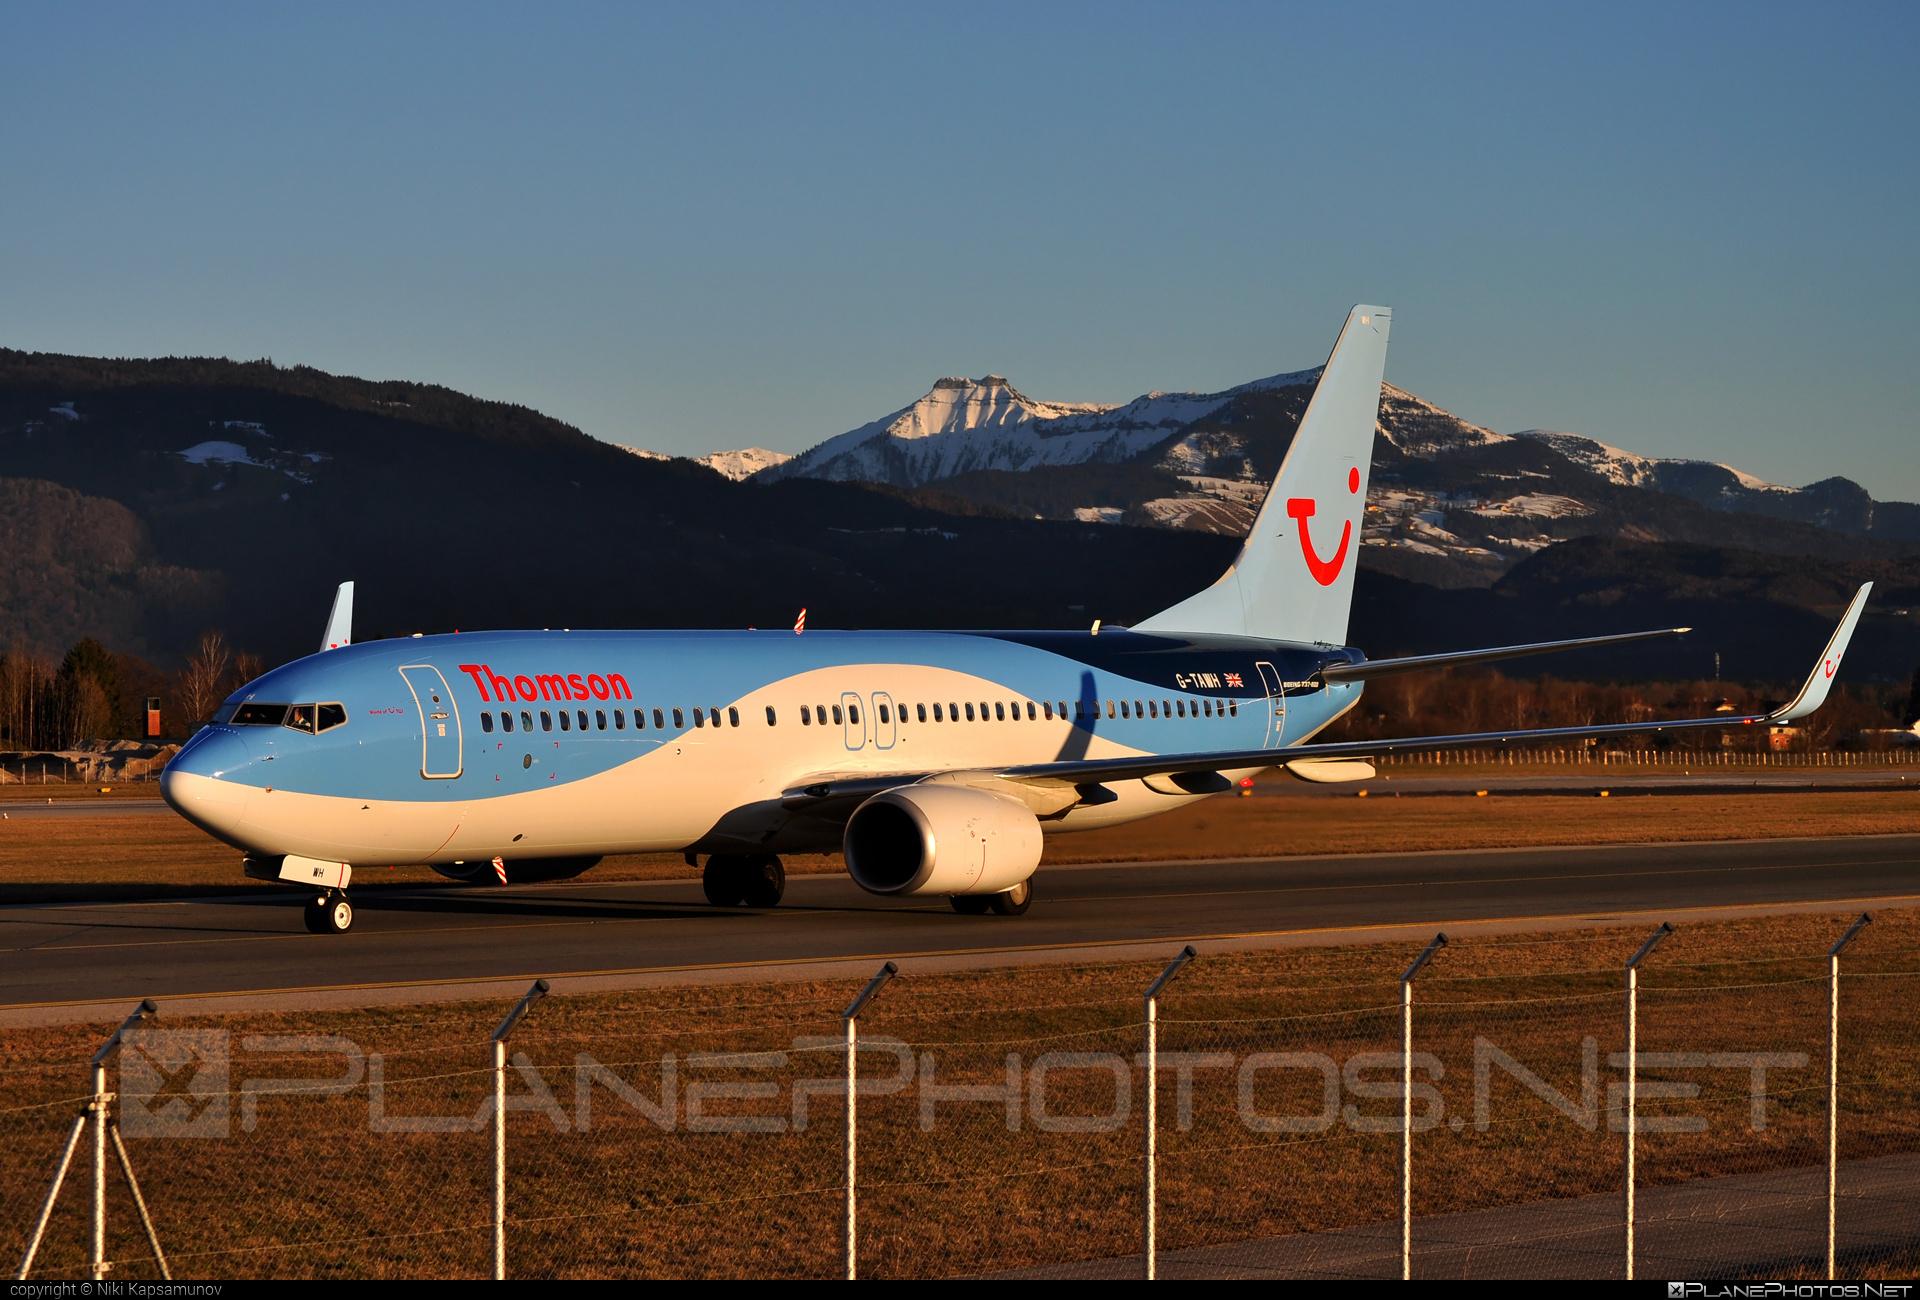 Boeing 737-800 - G-TAWH operated by Thomson Airways #b737 #b737nextgen #b737ng #boeing #boeing737